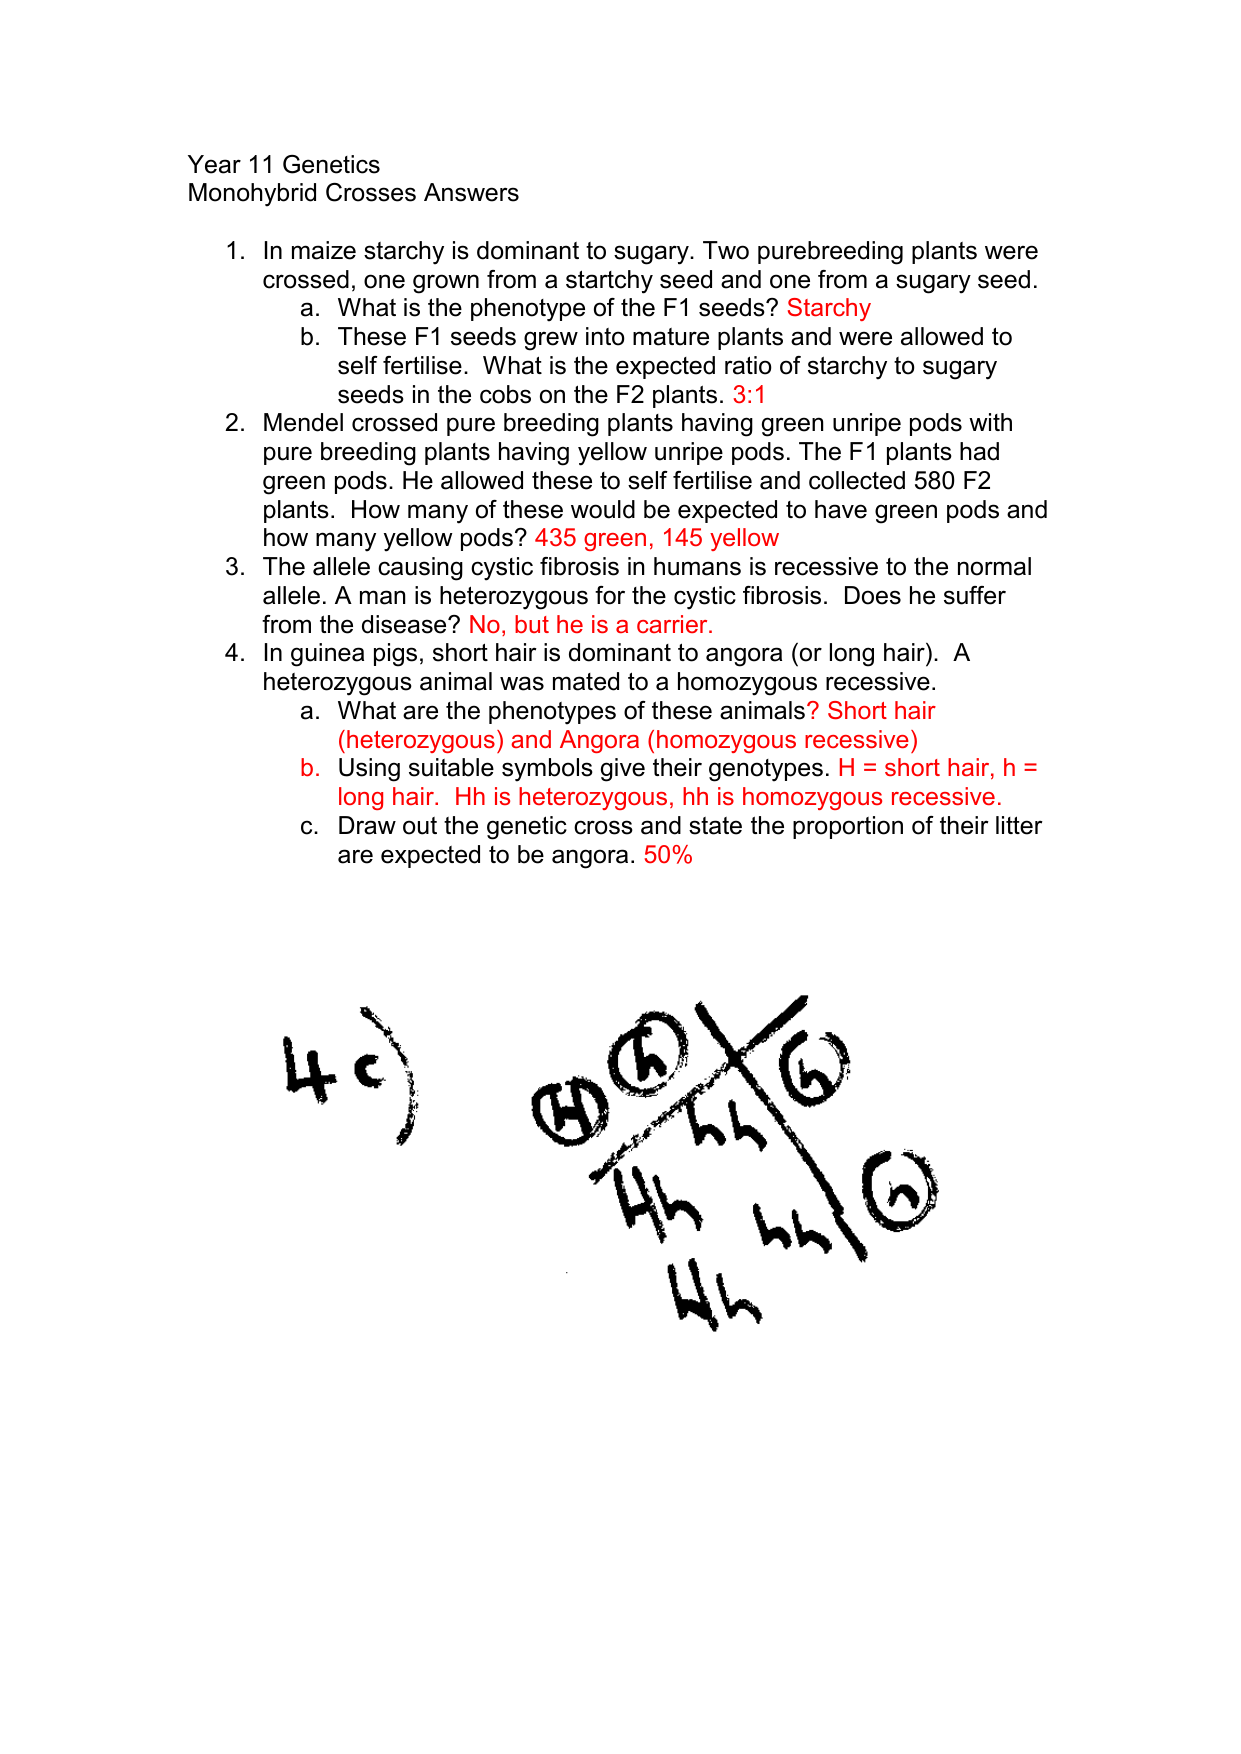 Monohybrid Crosses Practice Worksheet Answer Key ...